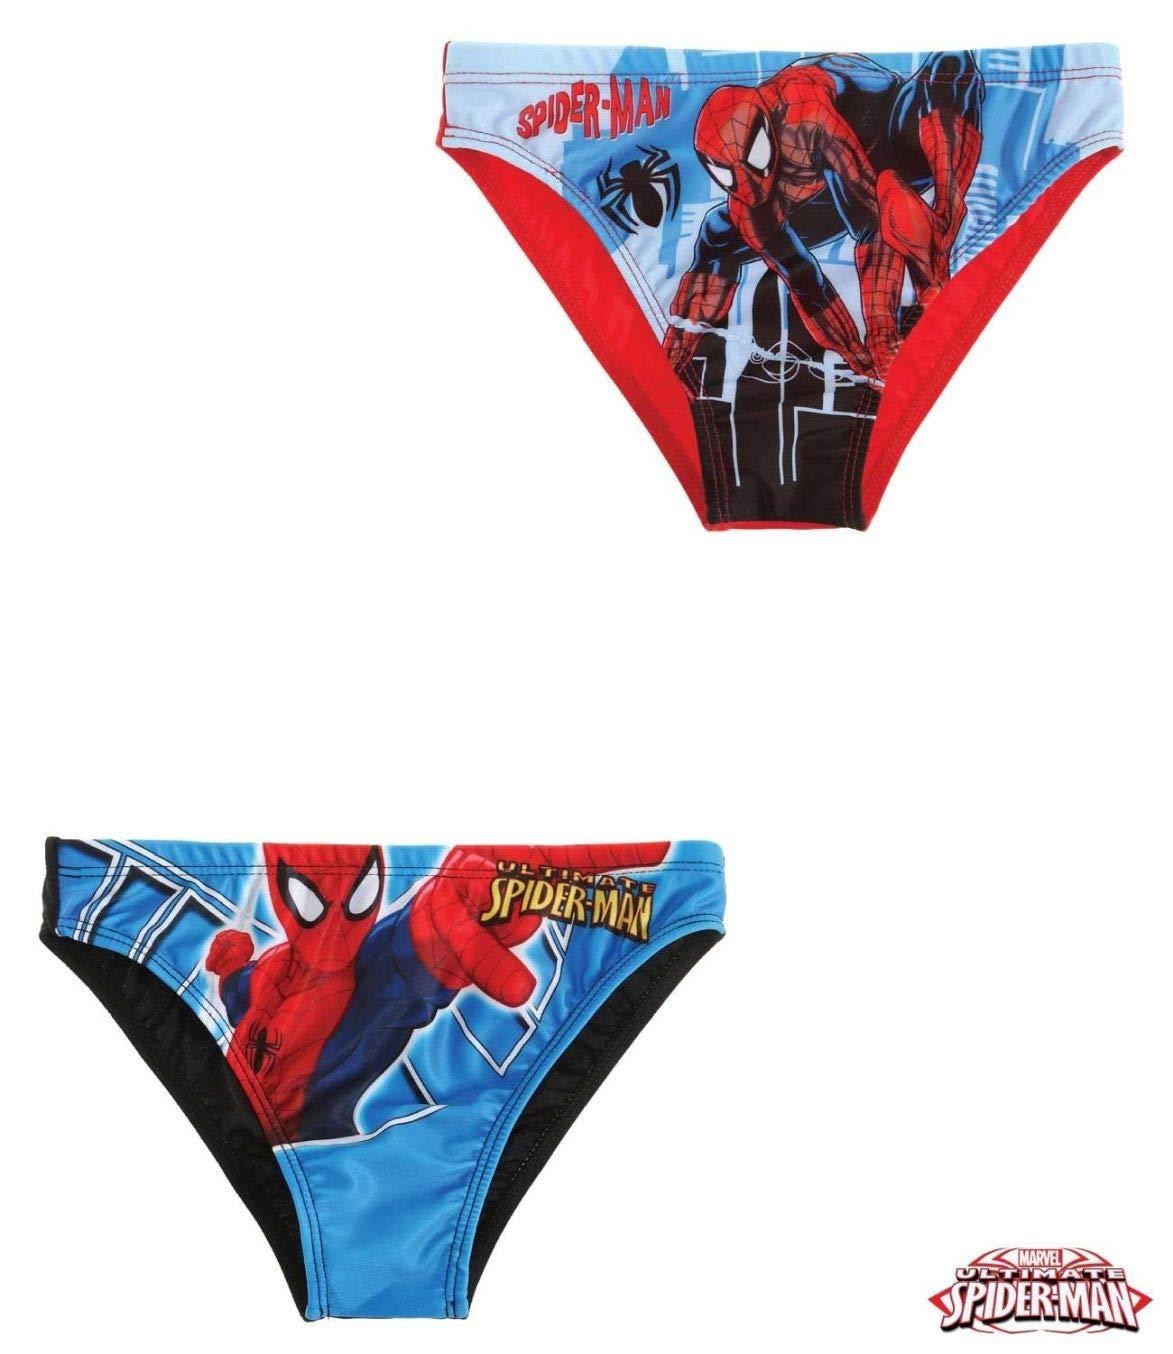 Spiderman Jungen Badehose Badeslip in 2